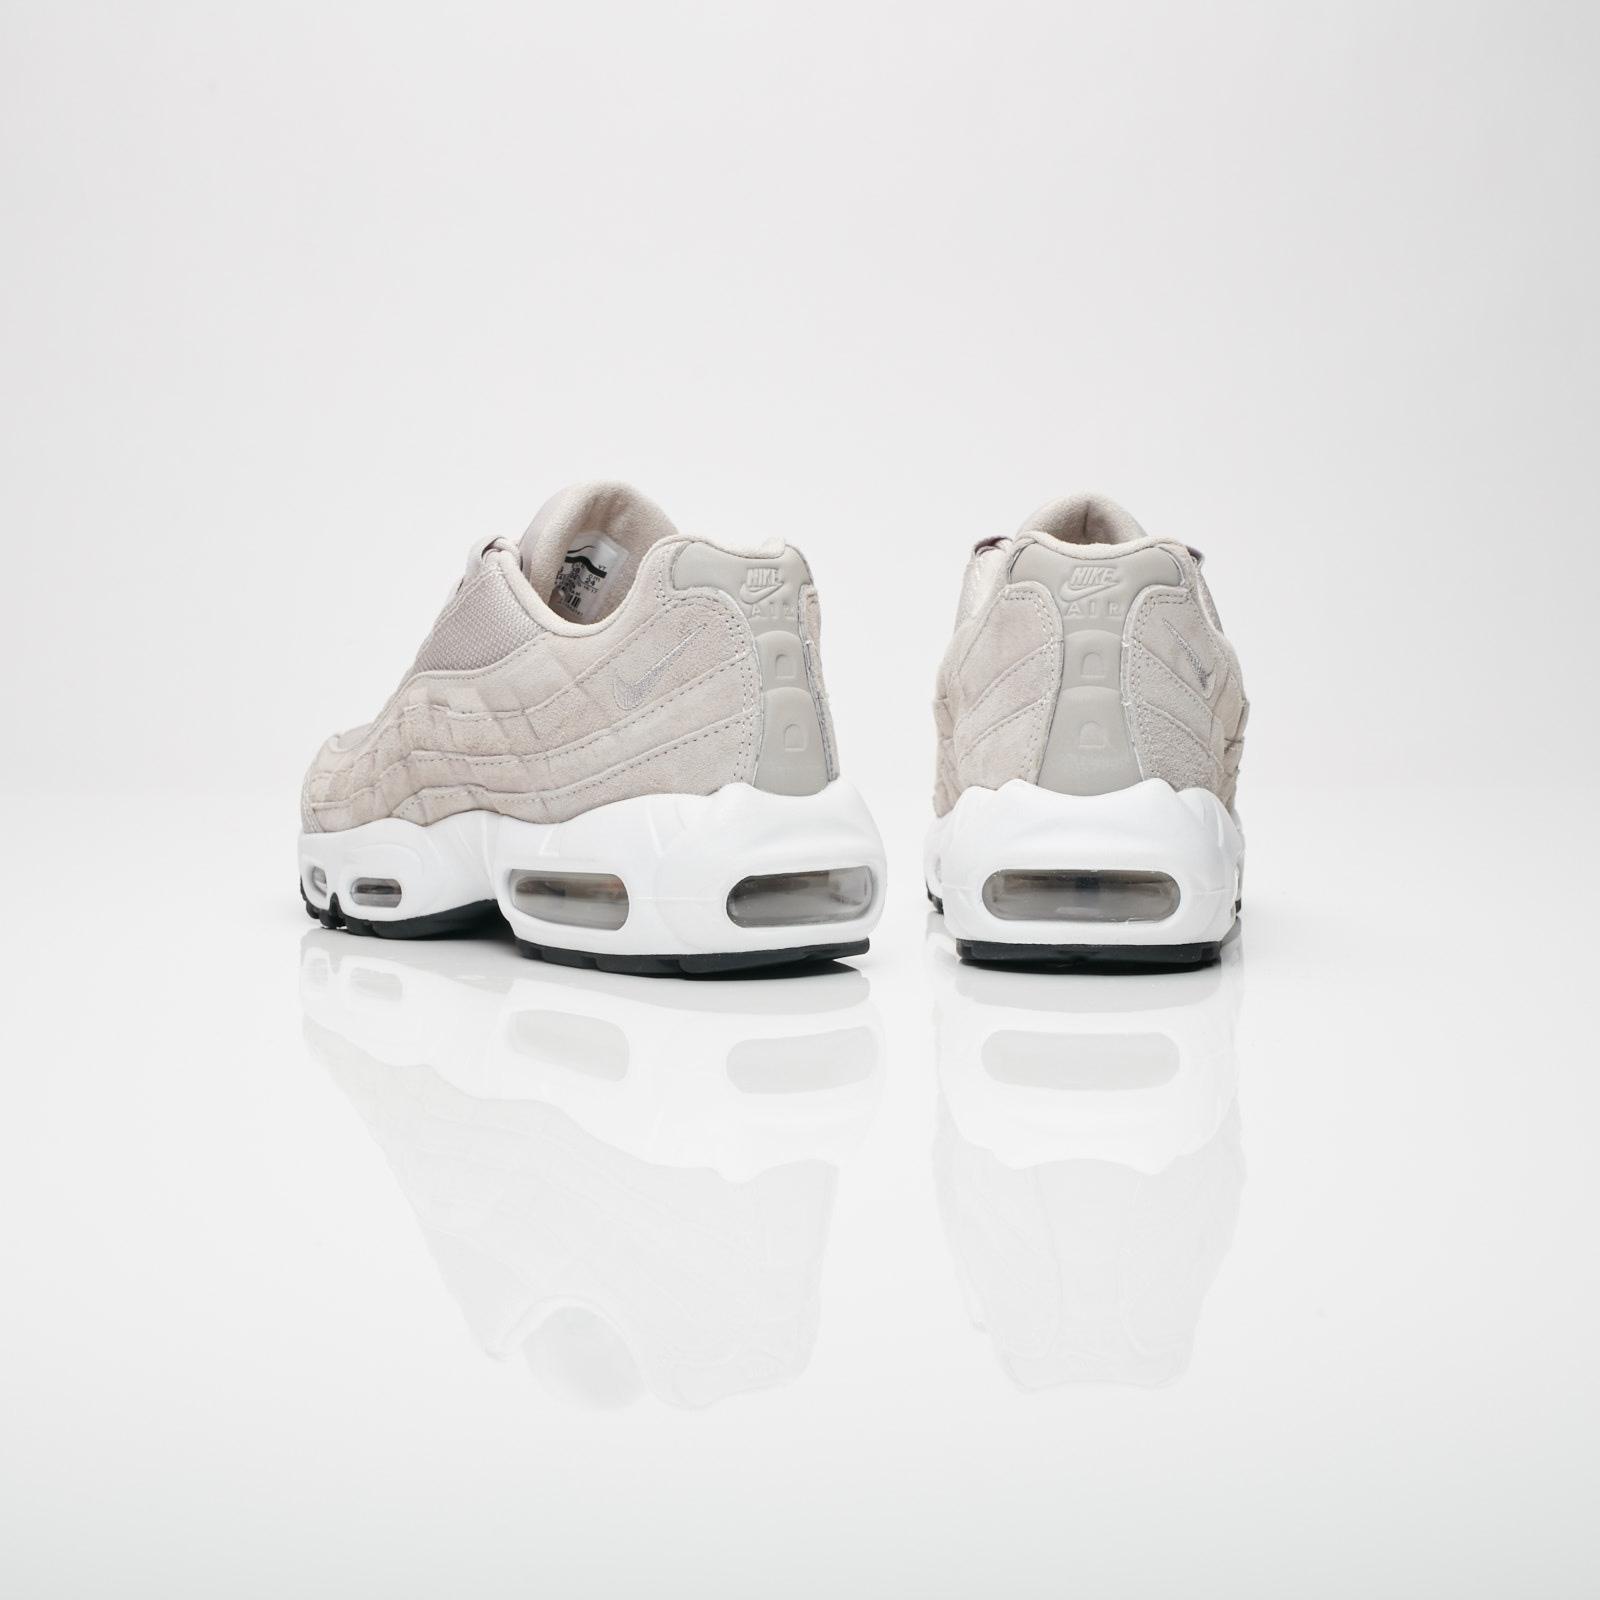 f878a5bff1 Nike Wmns Air Max 95 PRM - 807443-200 - Sneakersnstuff | sneakers &  streetwear på nätet sen 1999